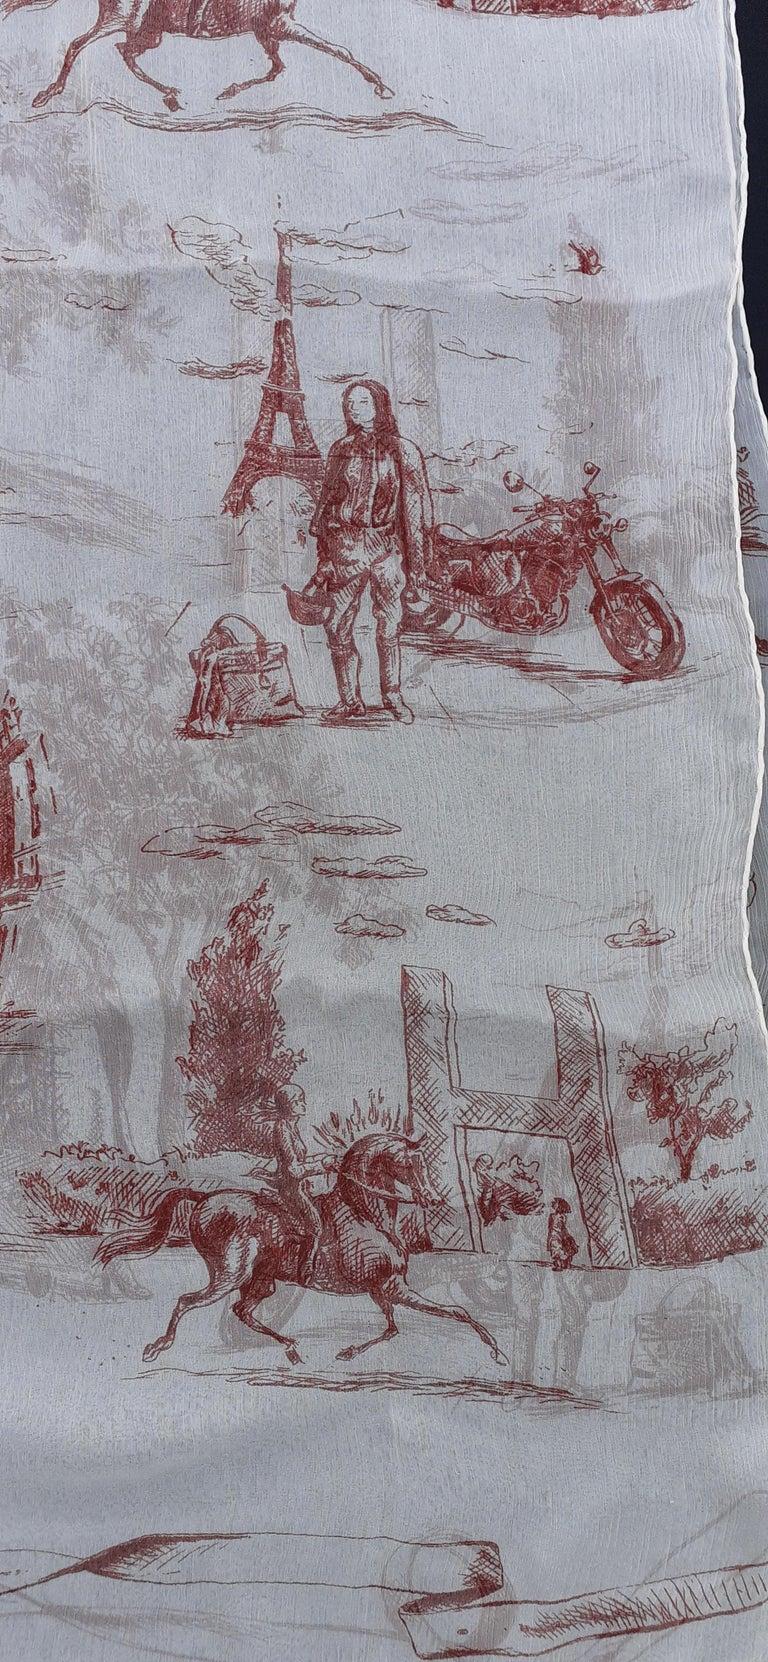 Hermès Chiffon Mousseline Silk Scarf Long Stole Toile de Jouy Pattern Rare In Excellent Condition For Sale In ., FR